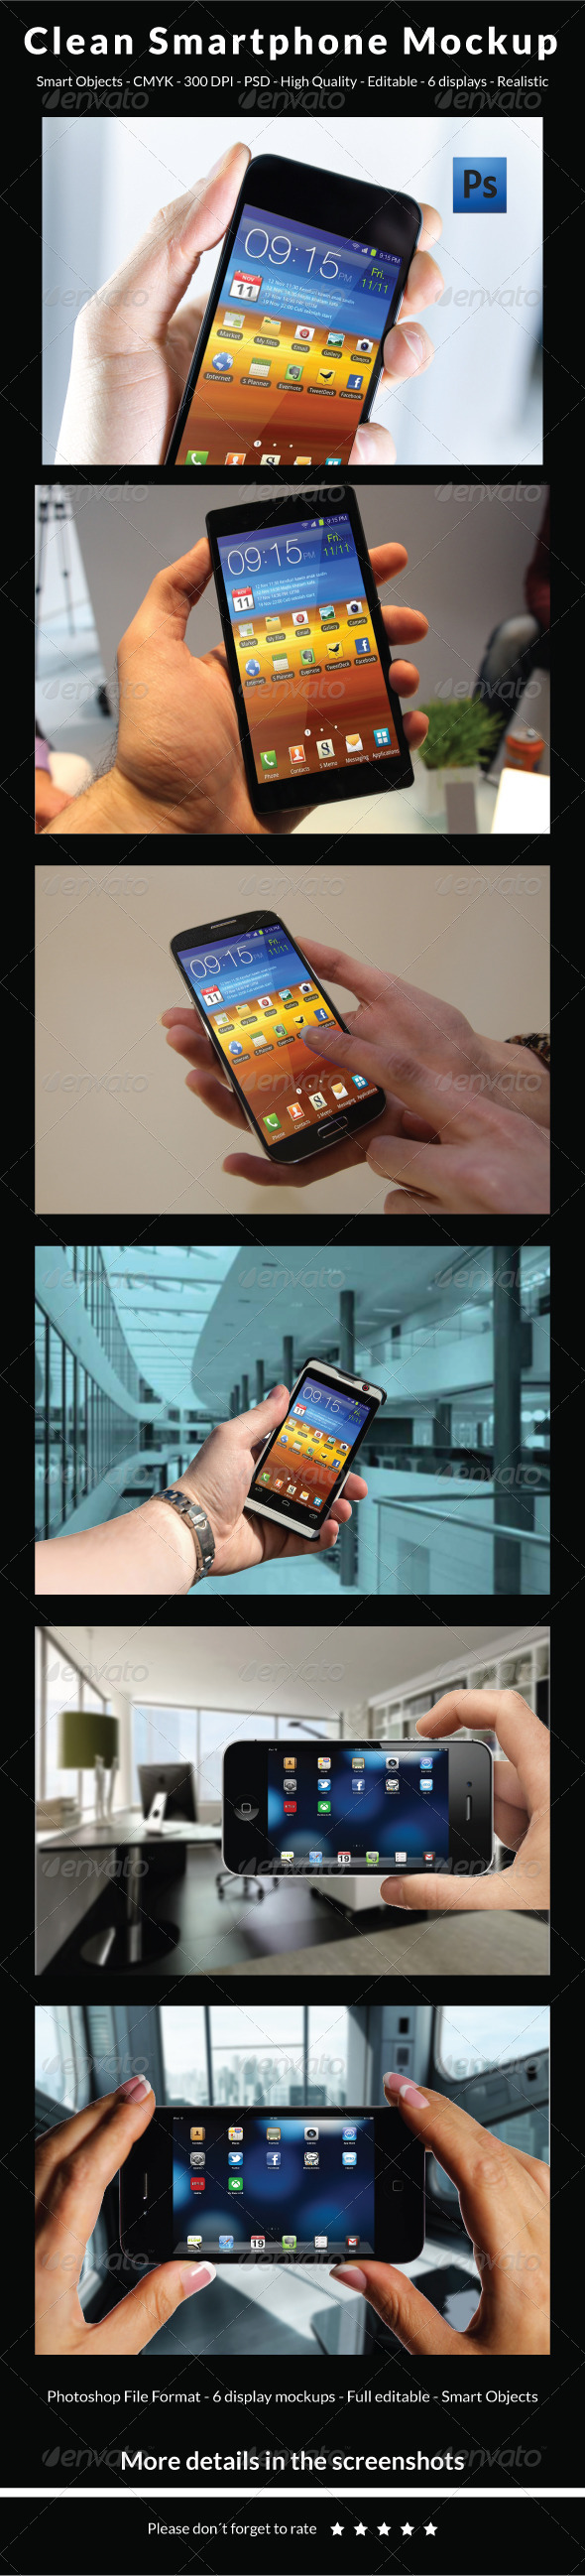 GraphicRiver Clean Smartphone Mockup 5959778